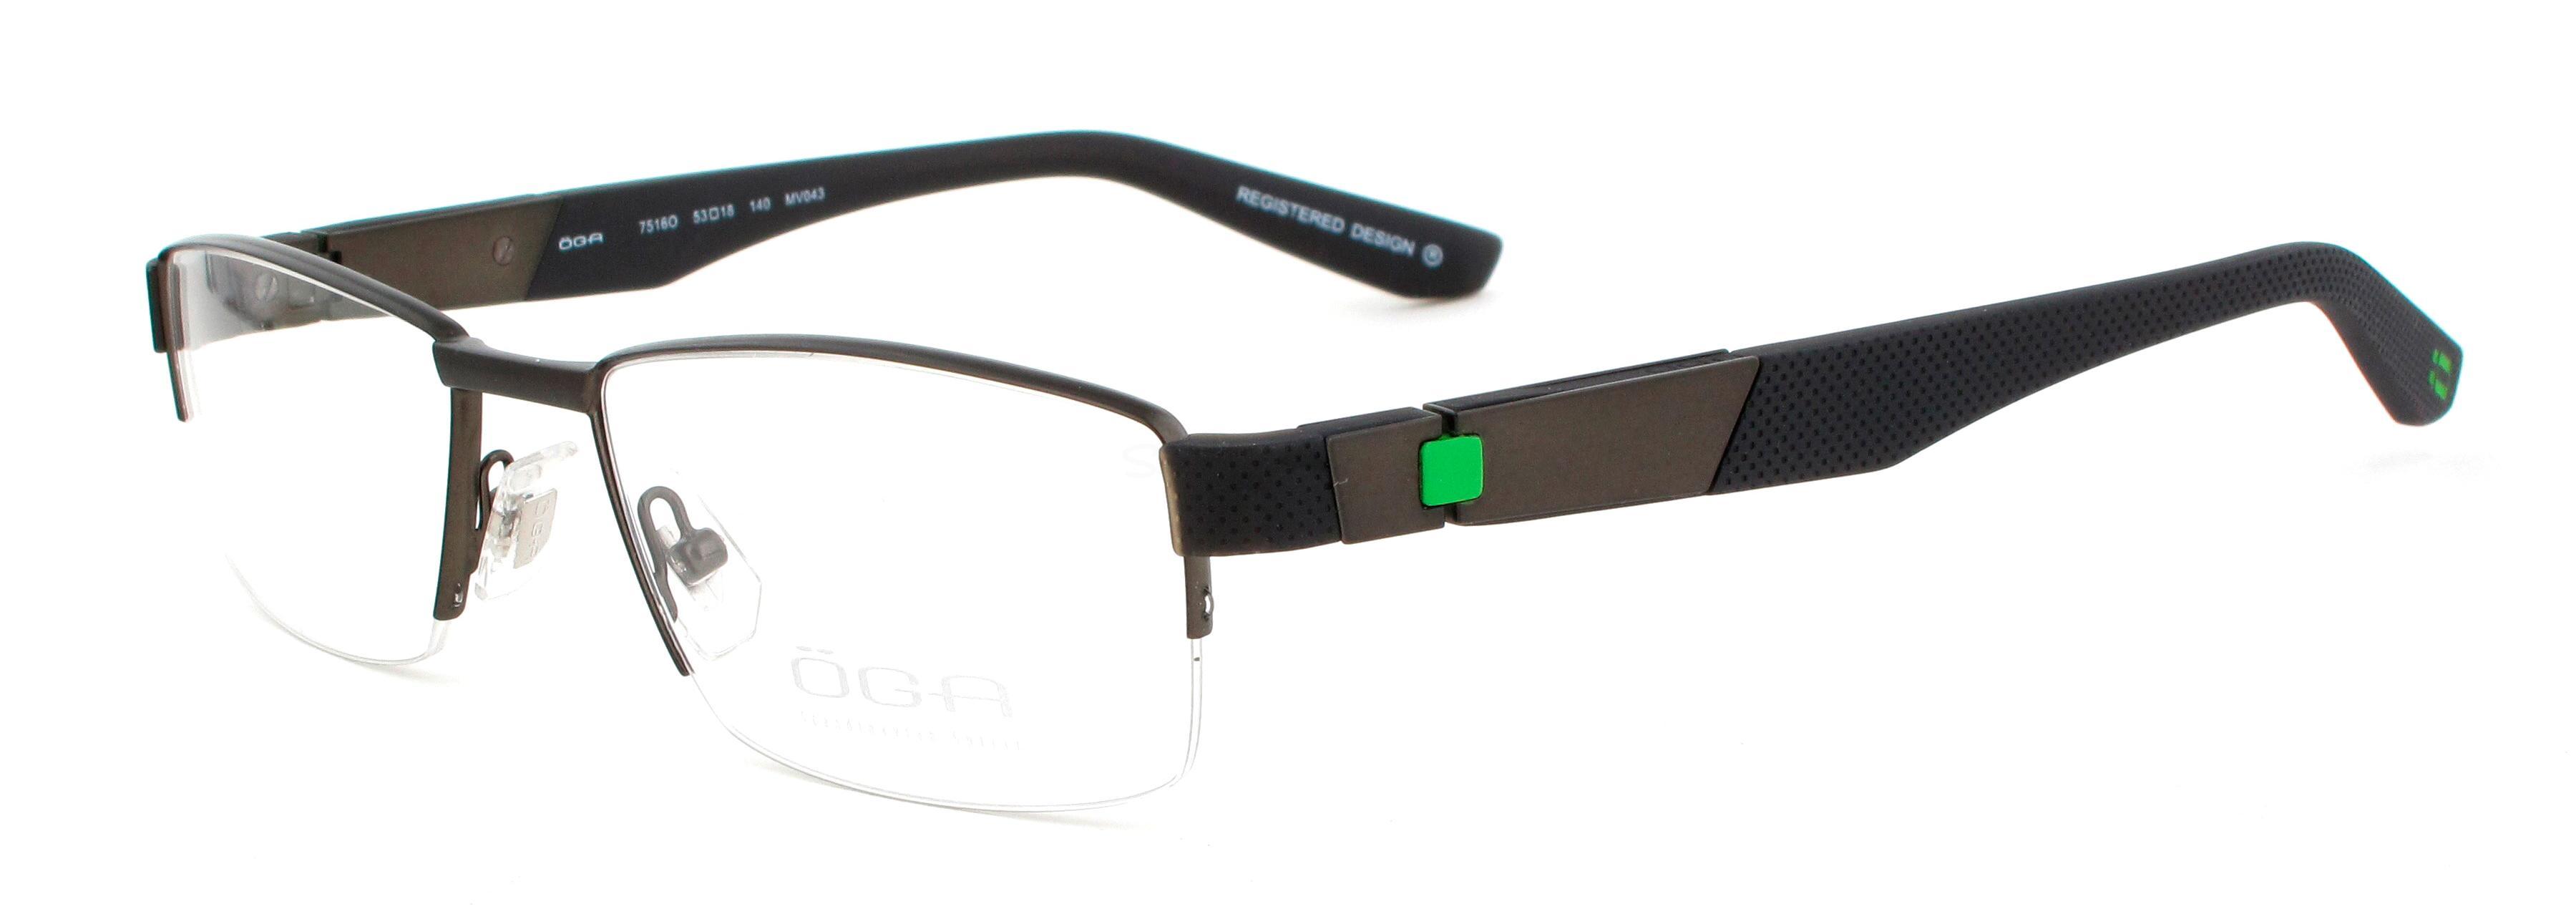 MV043 7516O FALK 3 Glasses, ÖGA Scandinavian Spirit